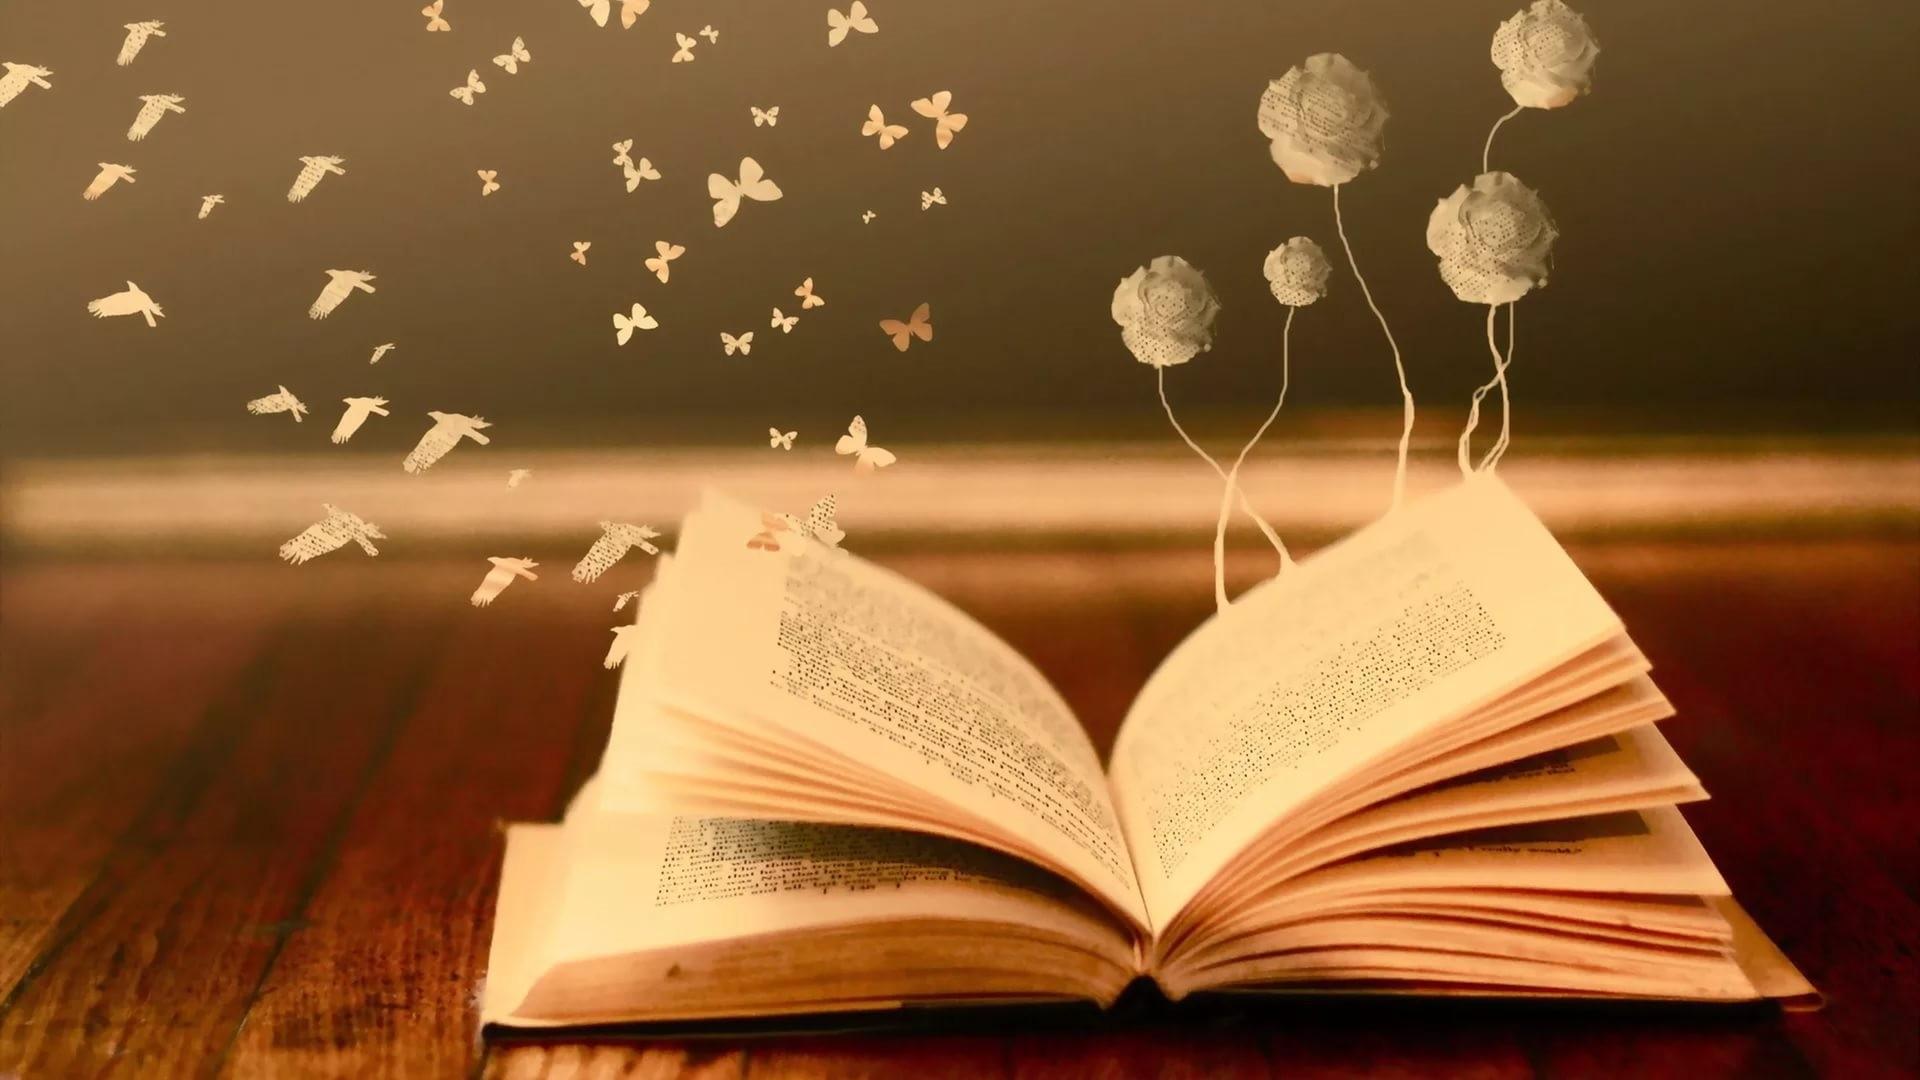 Books Background Wallpaper